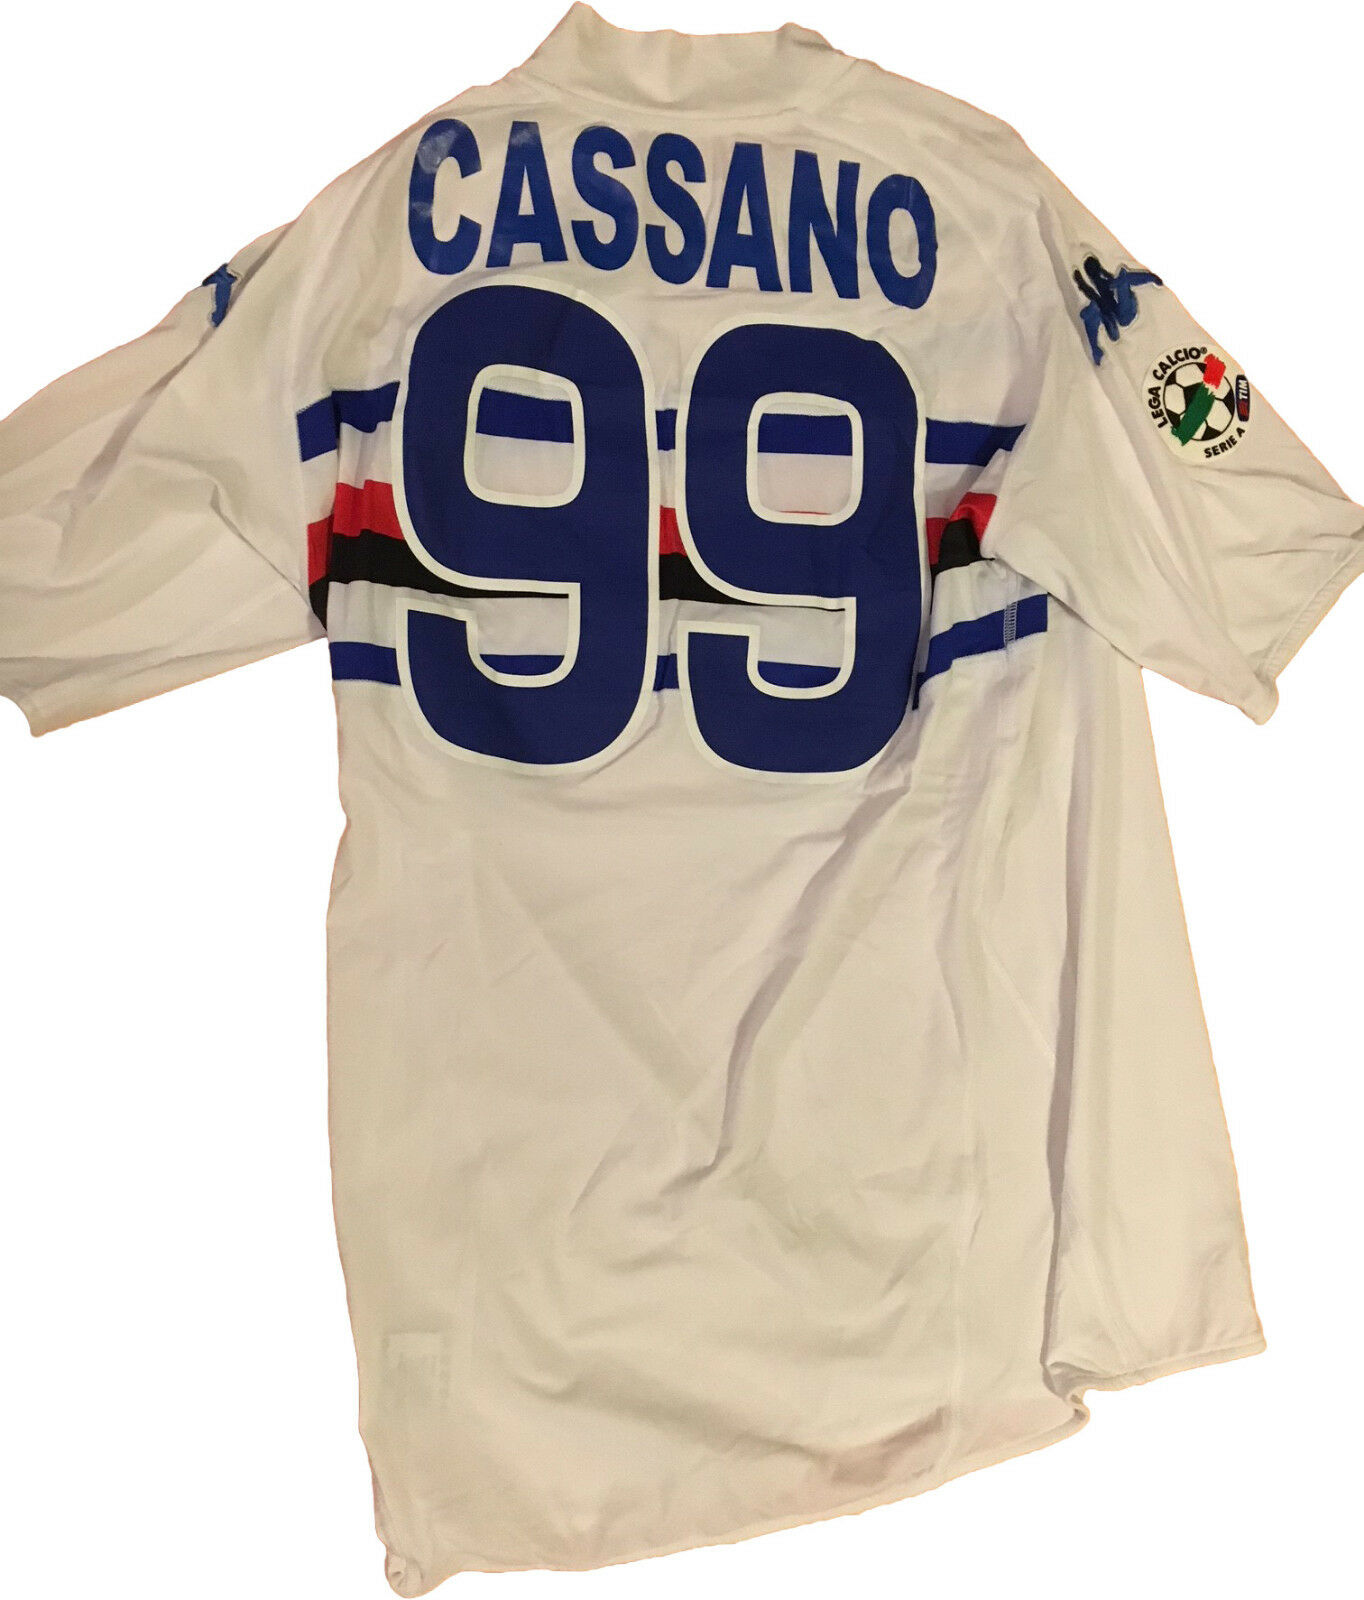 Maglia Sampdoria match worn CASSANO 2008 2009 SERIE A vintage shirt